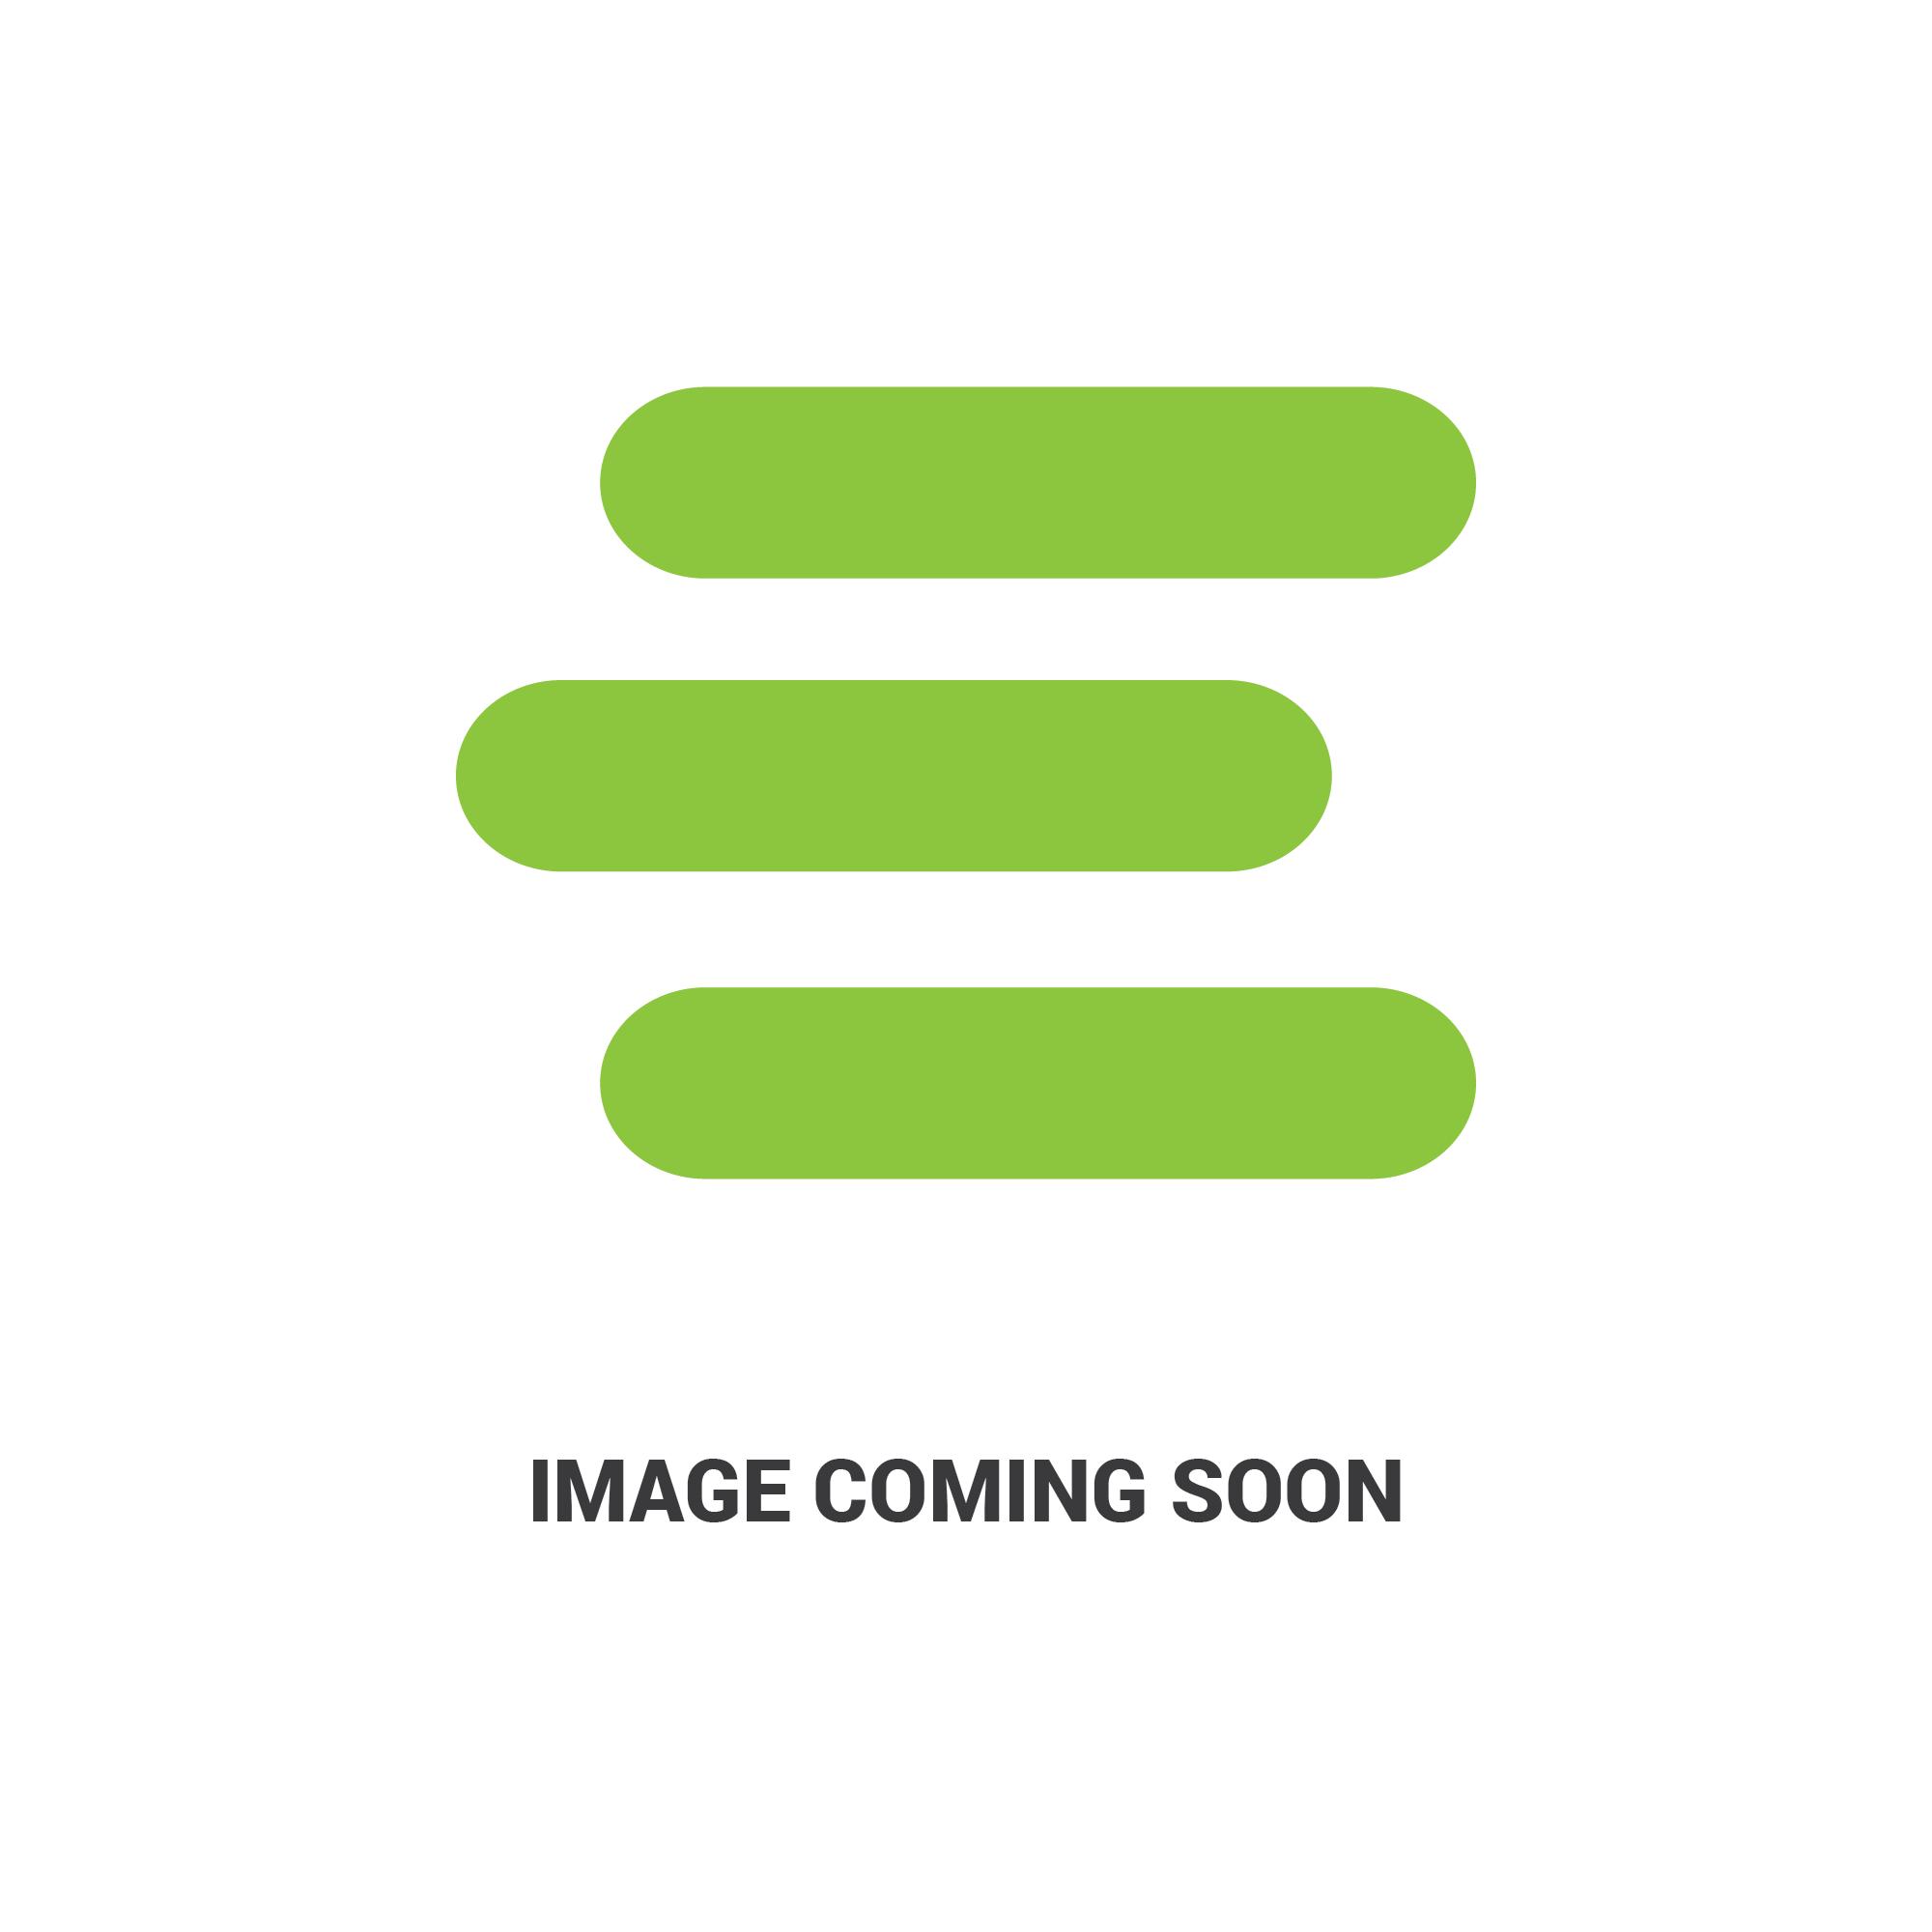 E-76611-45110edit 4.jpg